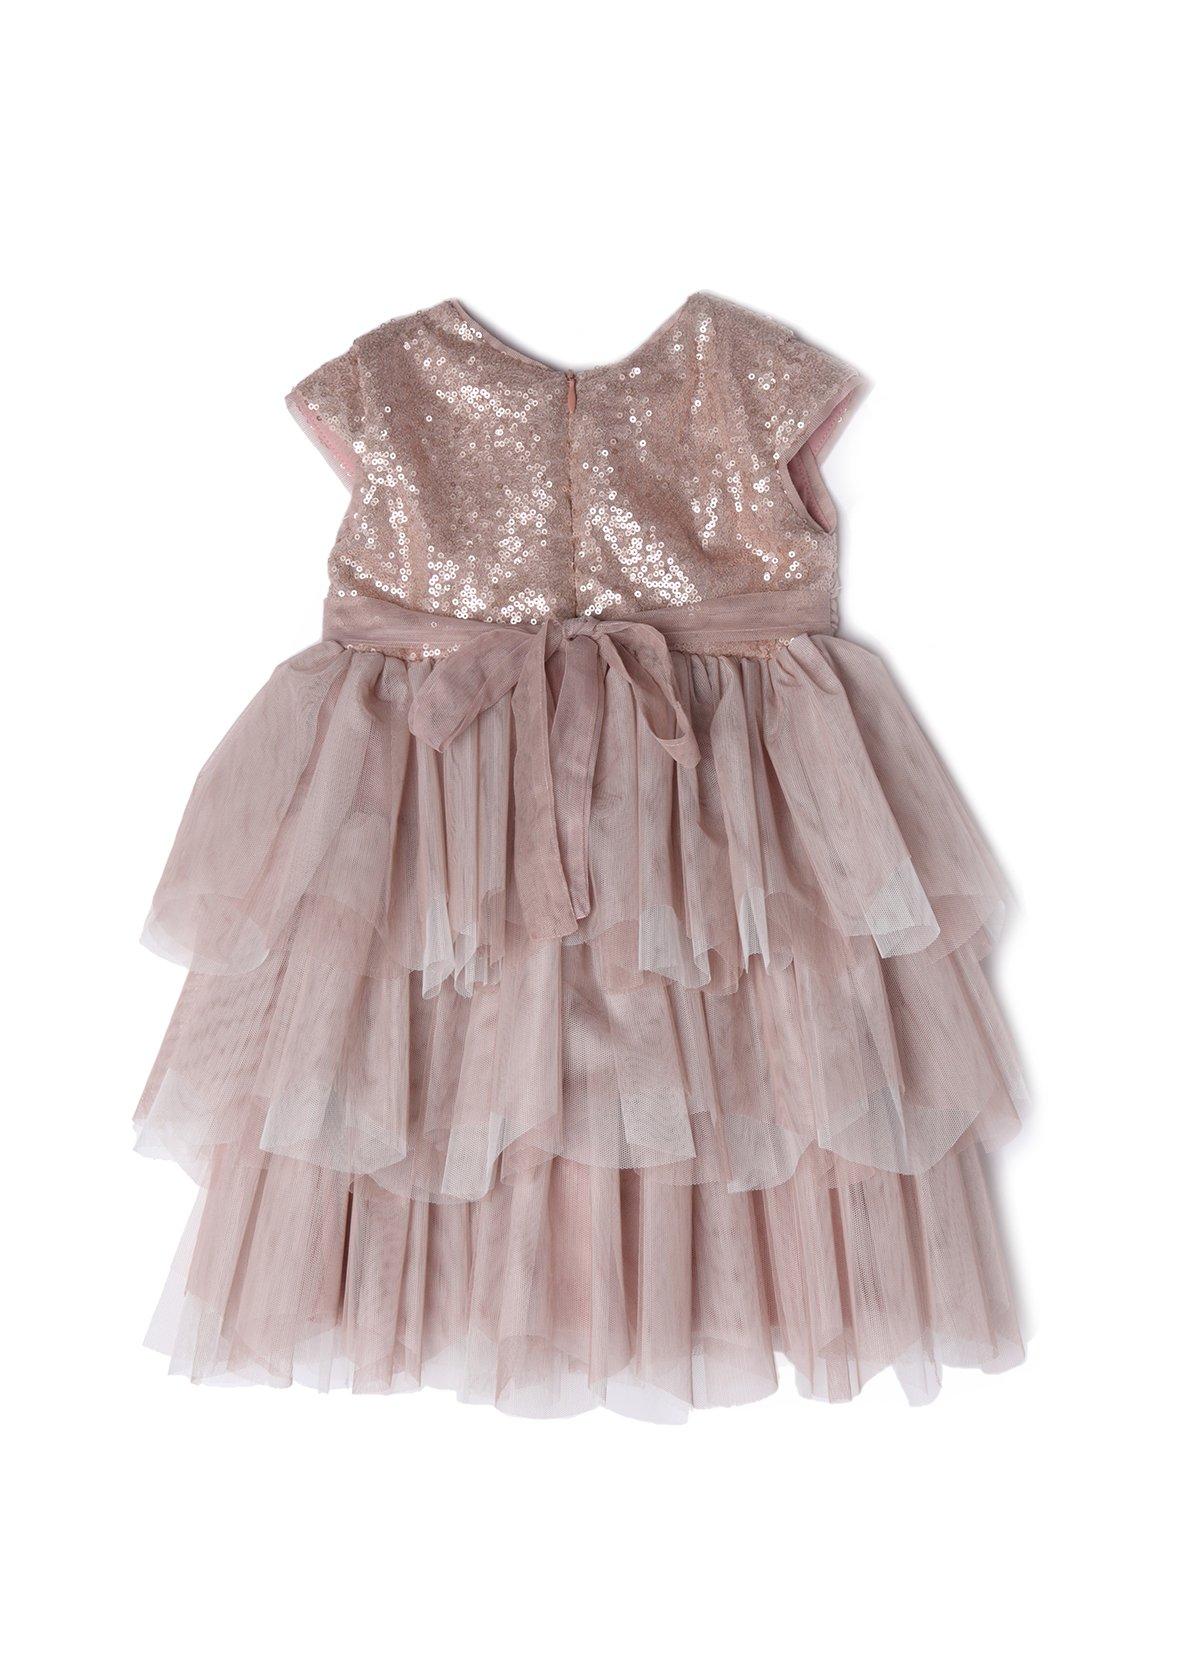 38419de84fe Amazon.com  Isobella   Chloe  Knitwear